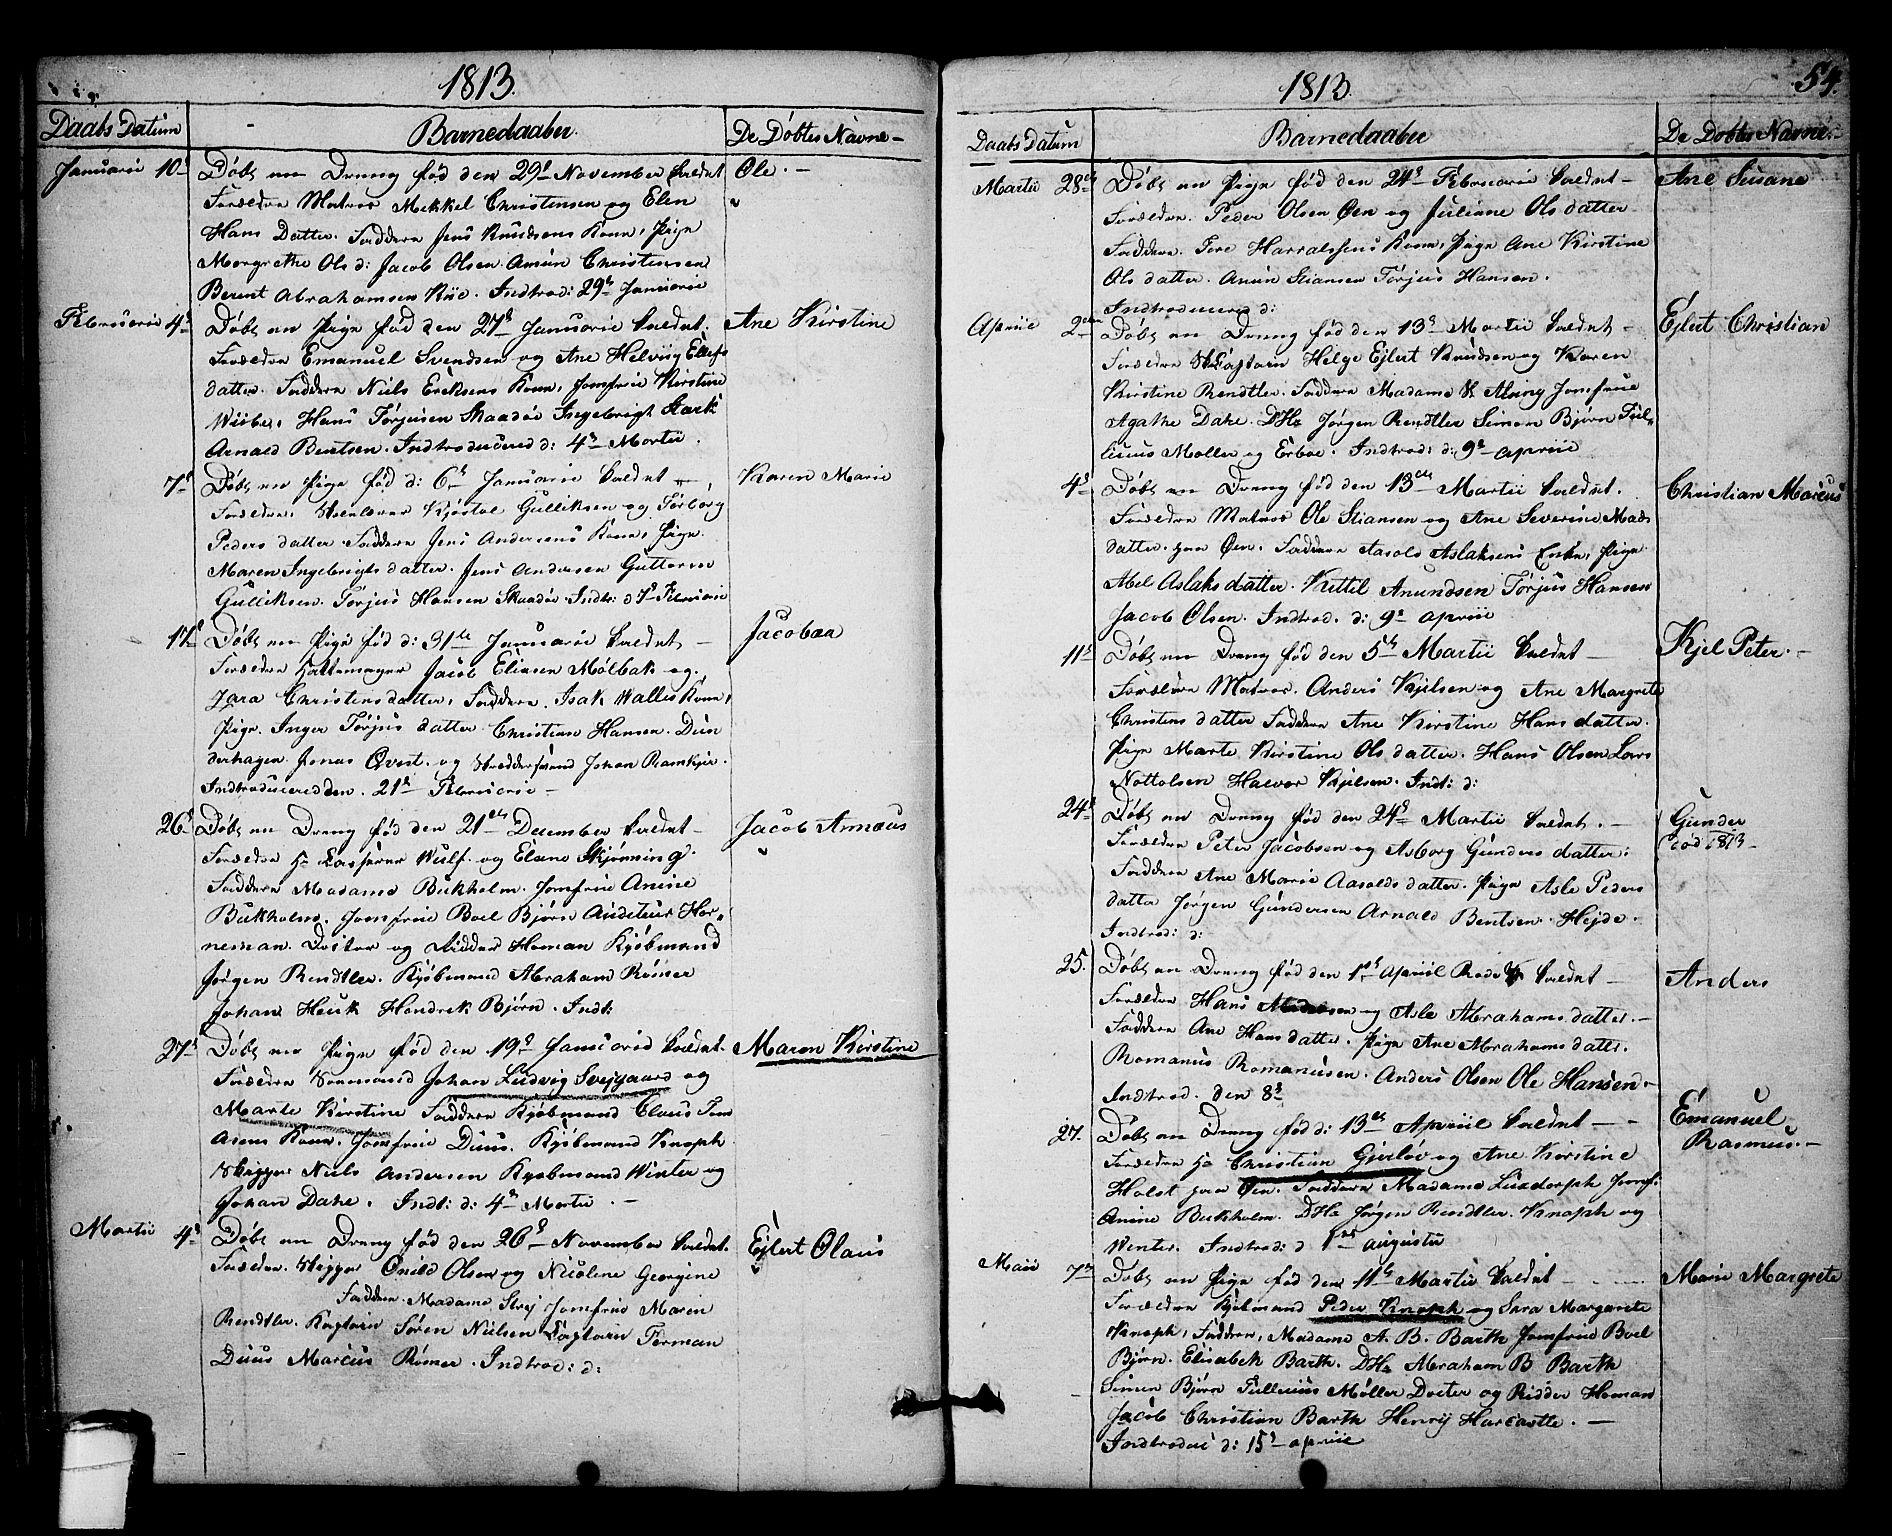 SAKO, Kragerø kirkebøker, F/Fa/L0003: Ministerialbok nr. 3, 1802-1813, s. 54